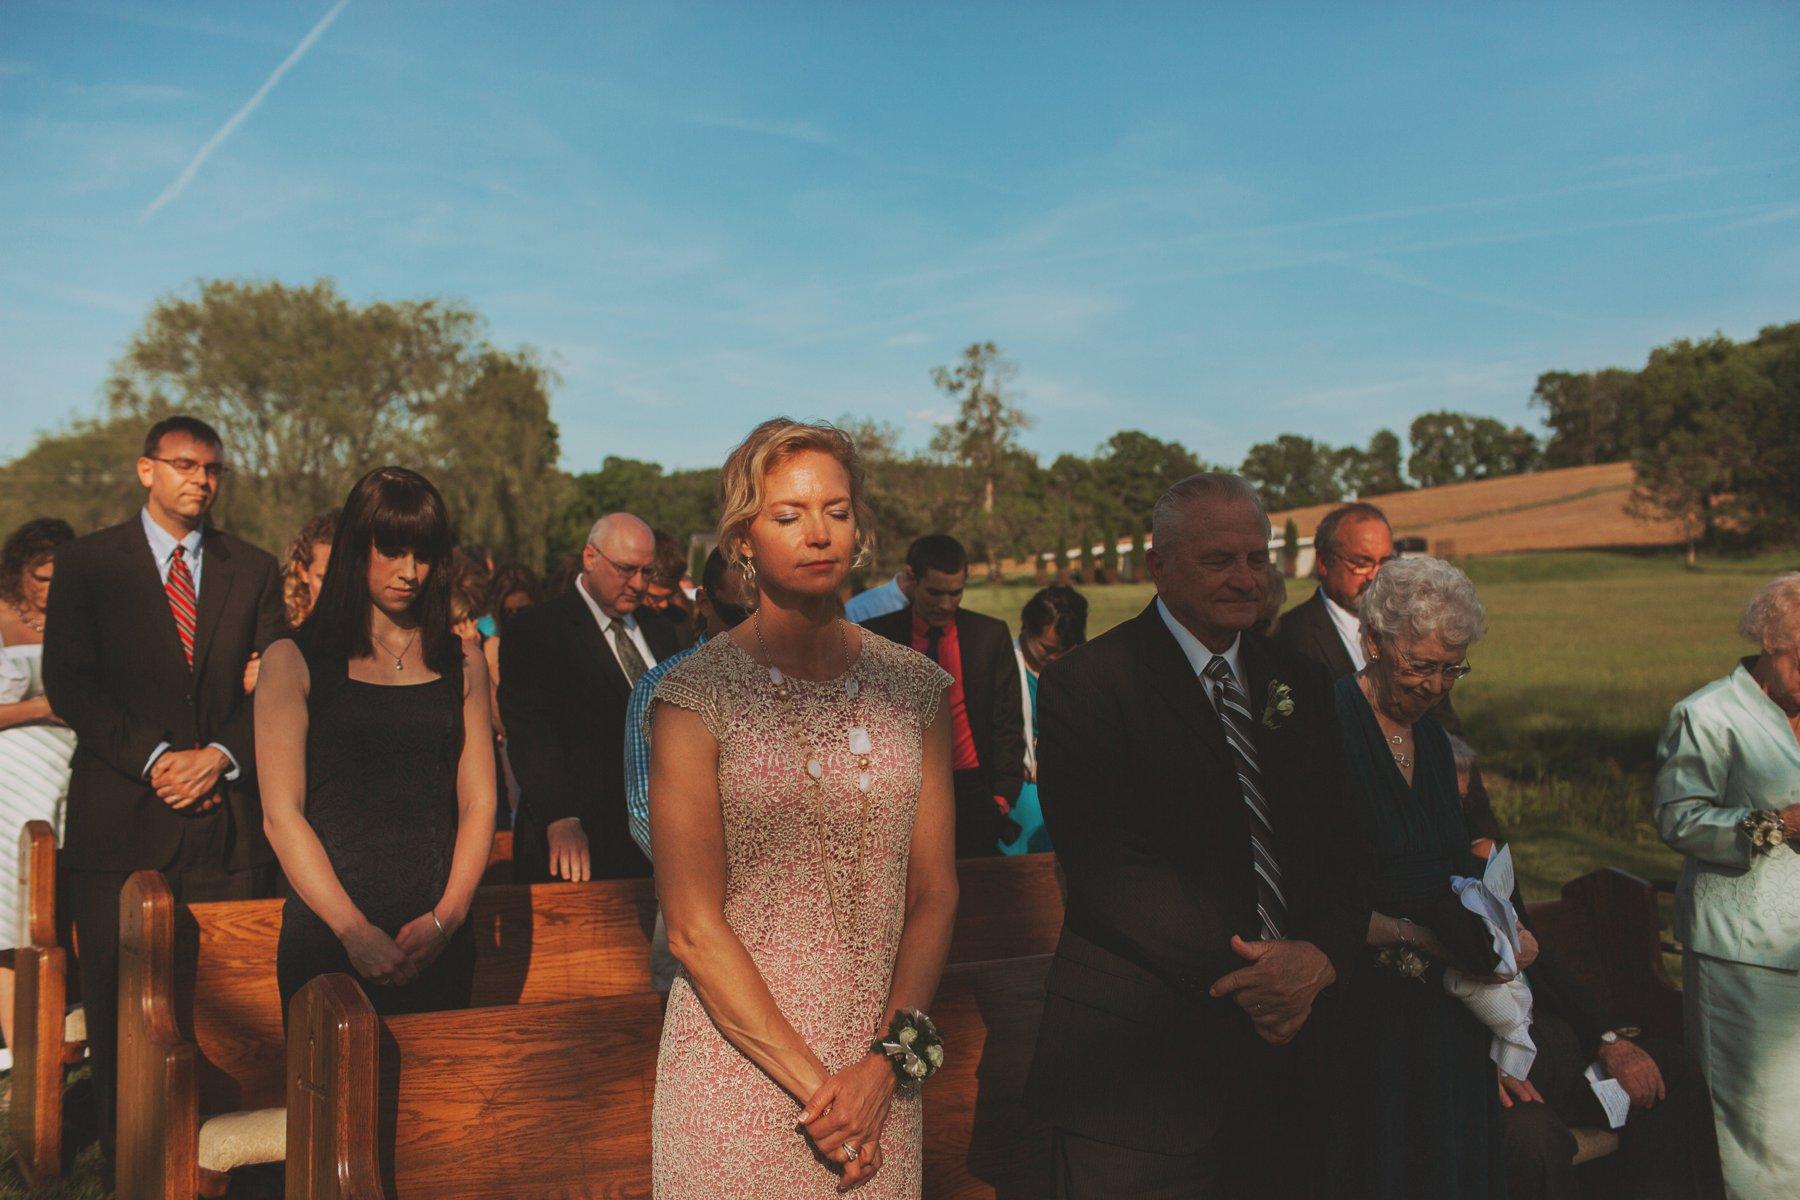 Ostertag Vistas Wedding Photos | Maryland Farm Wedding